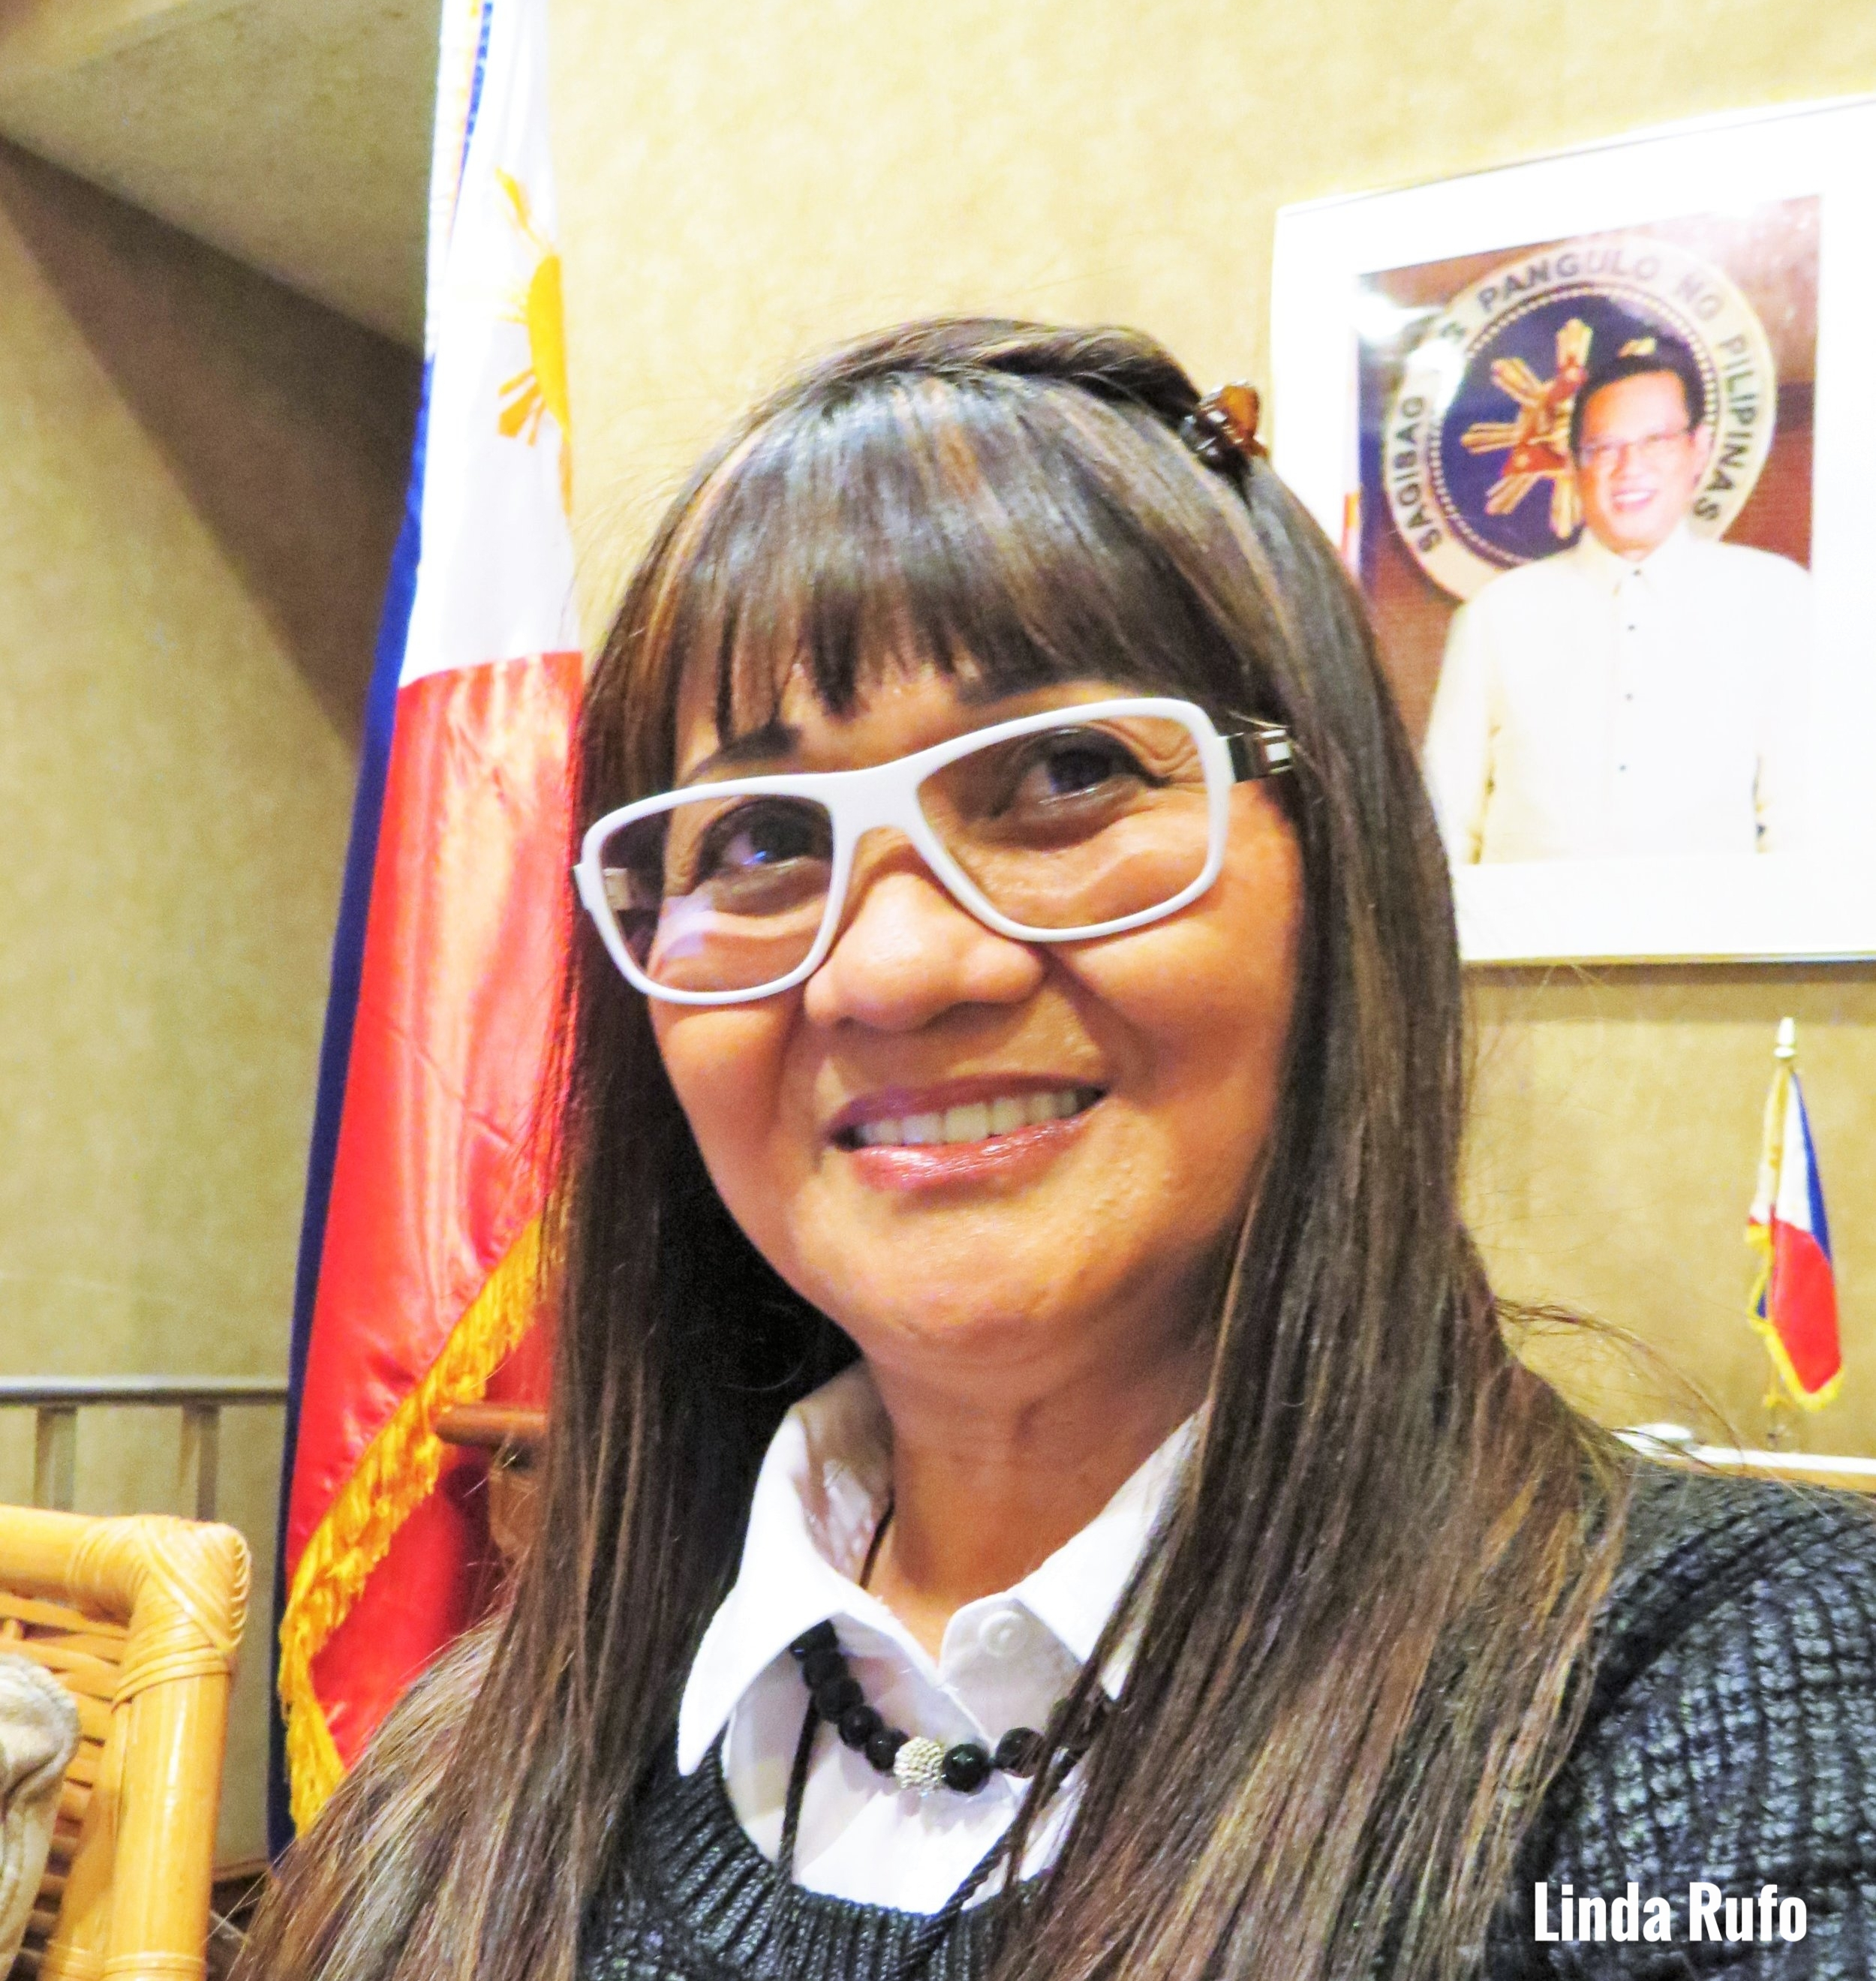 Linda Rufo is a muralist, painter, educator, restorer, and art therapist